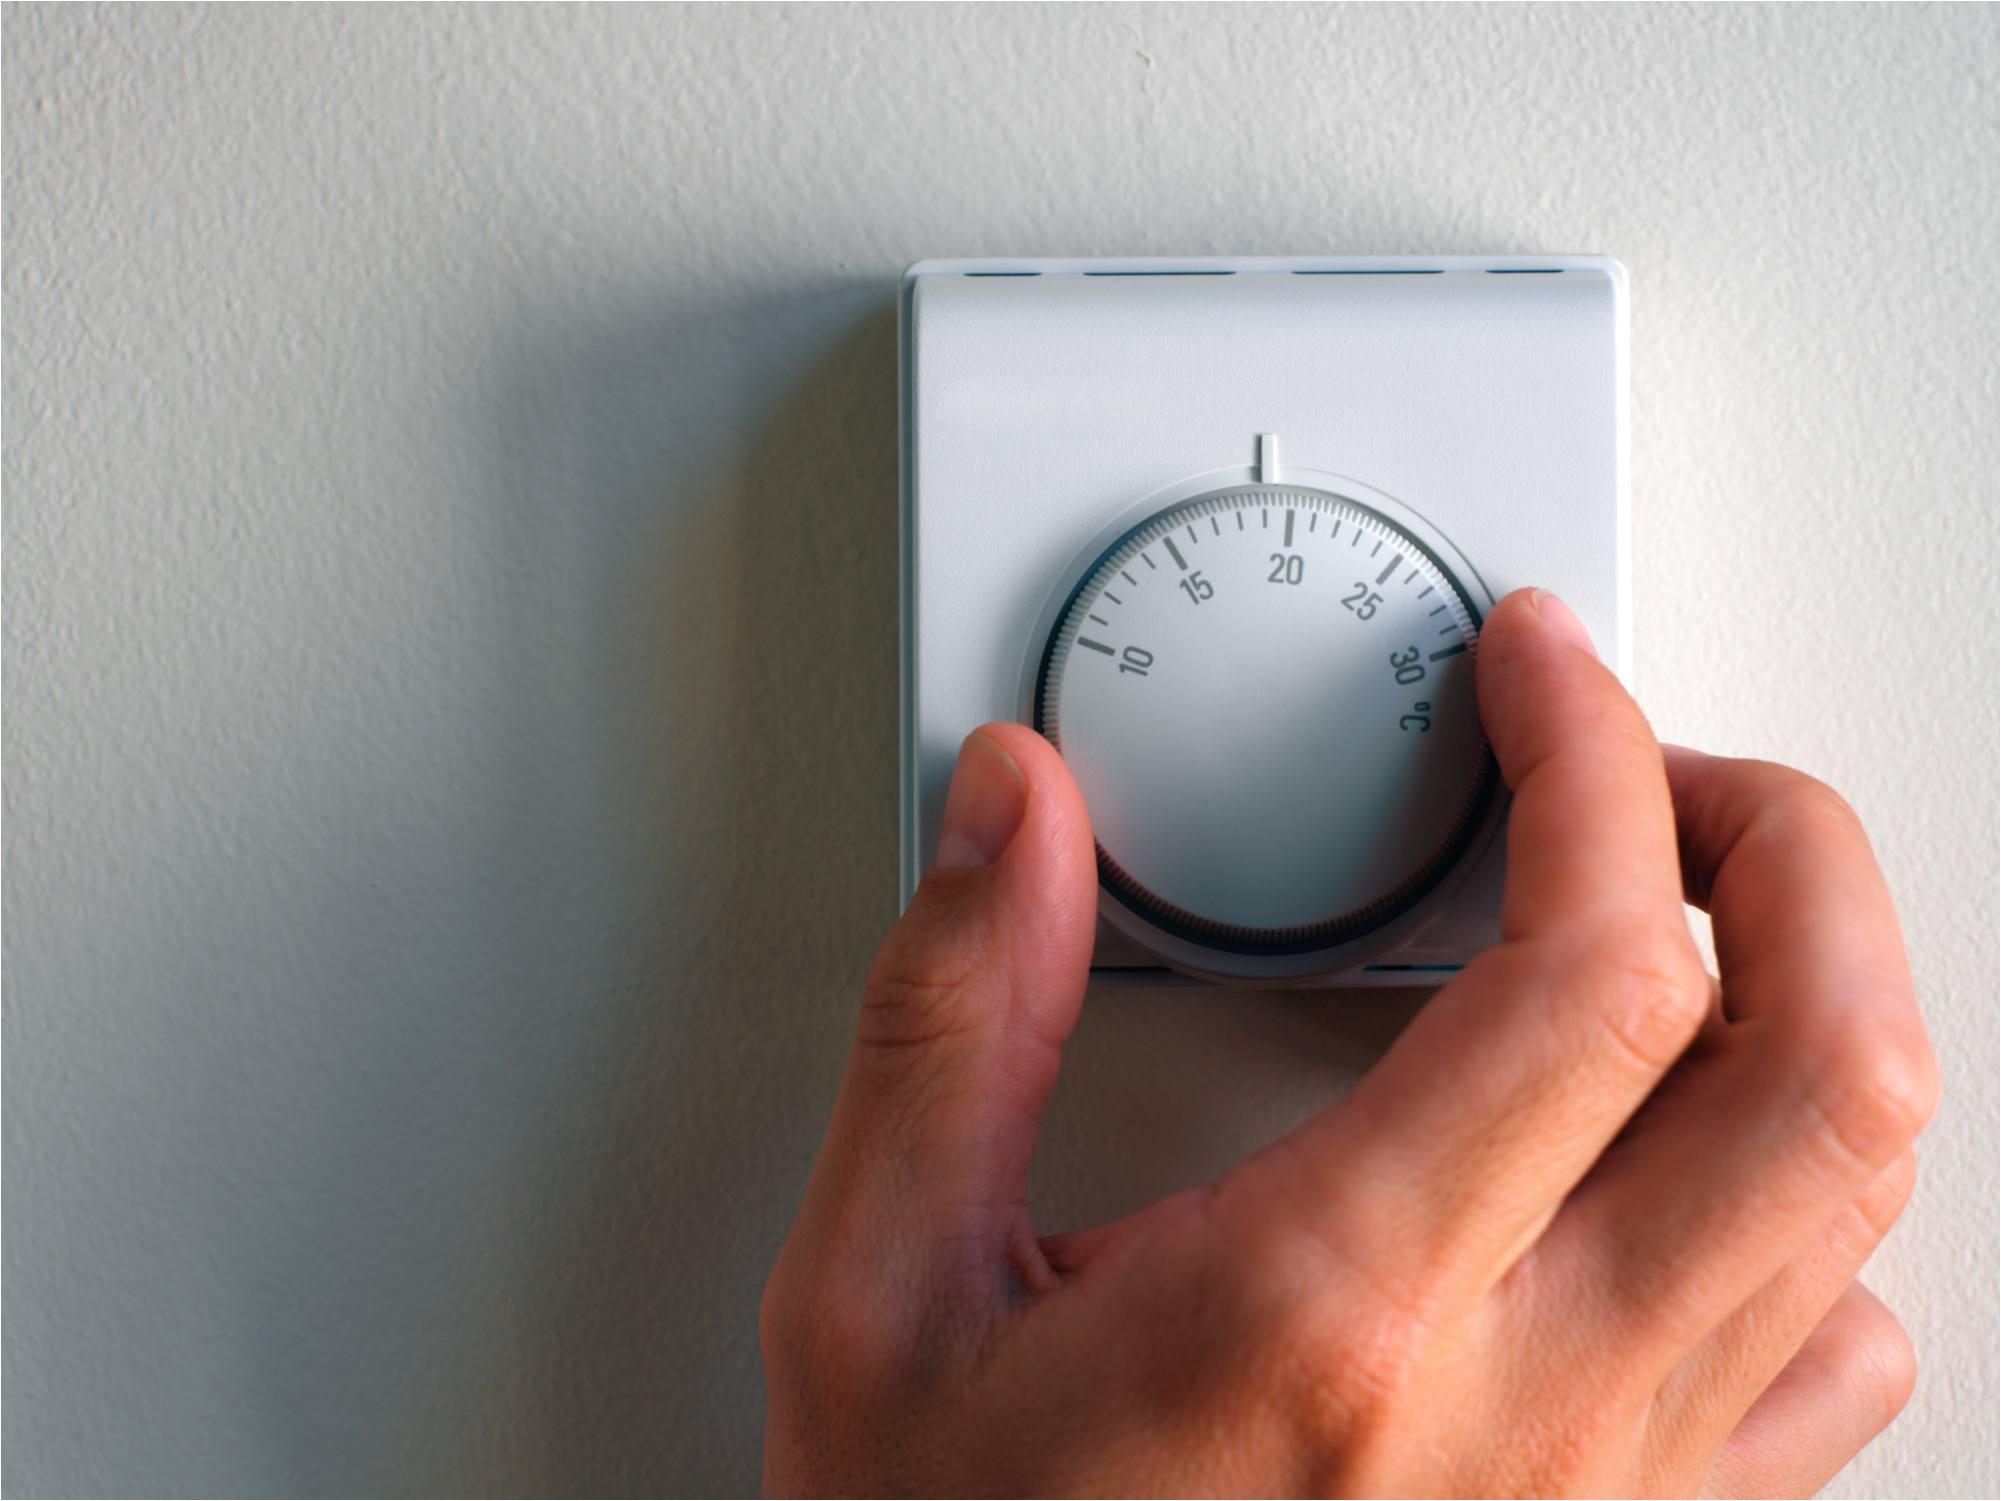 install line voltage thermostat 200143088 001 56a4a0a63df78cf77283516e jpg